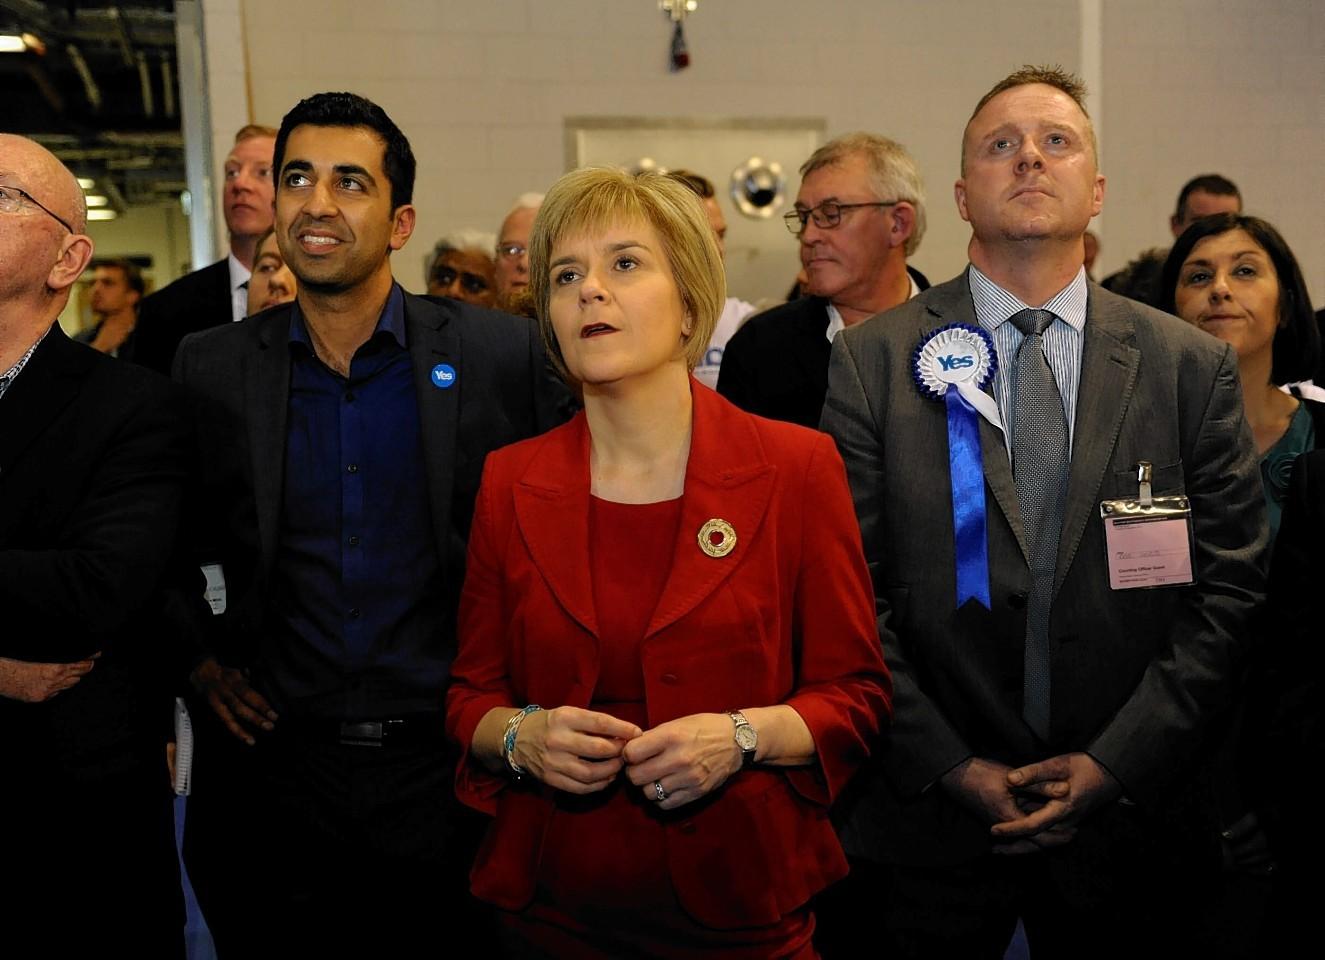 Nicola Sturgeon in red